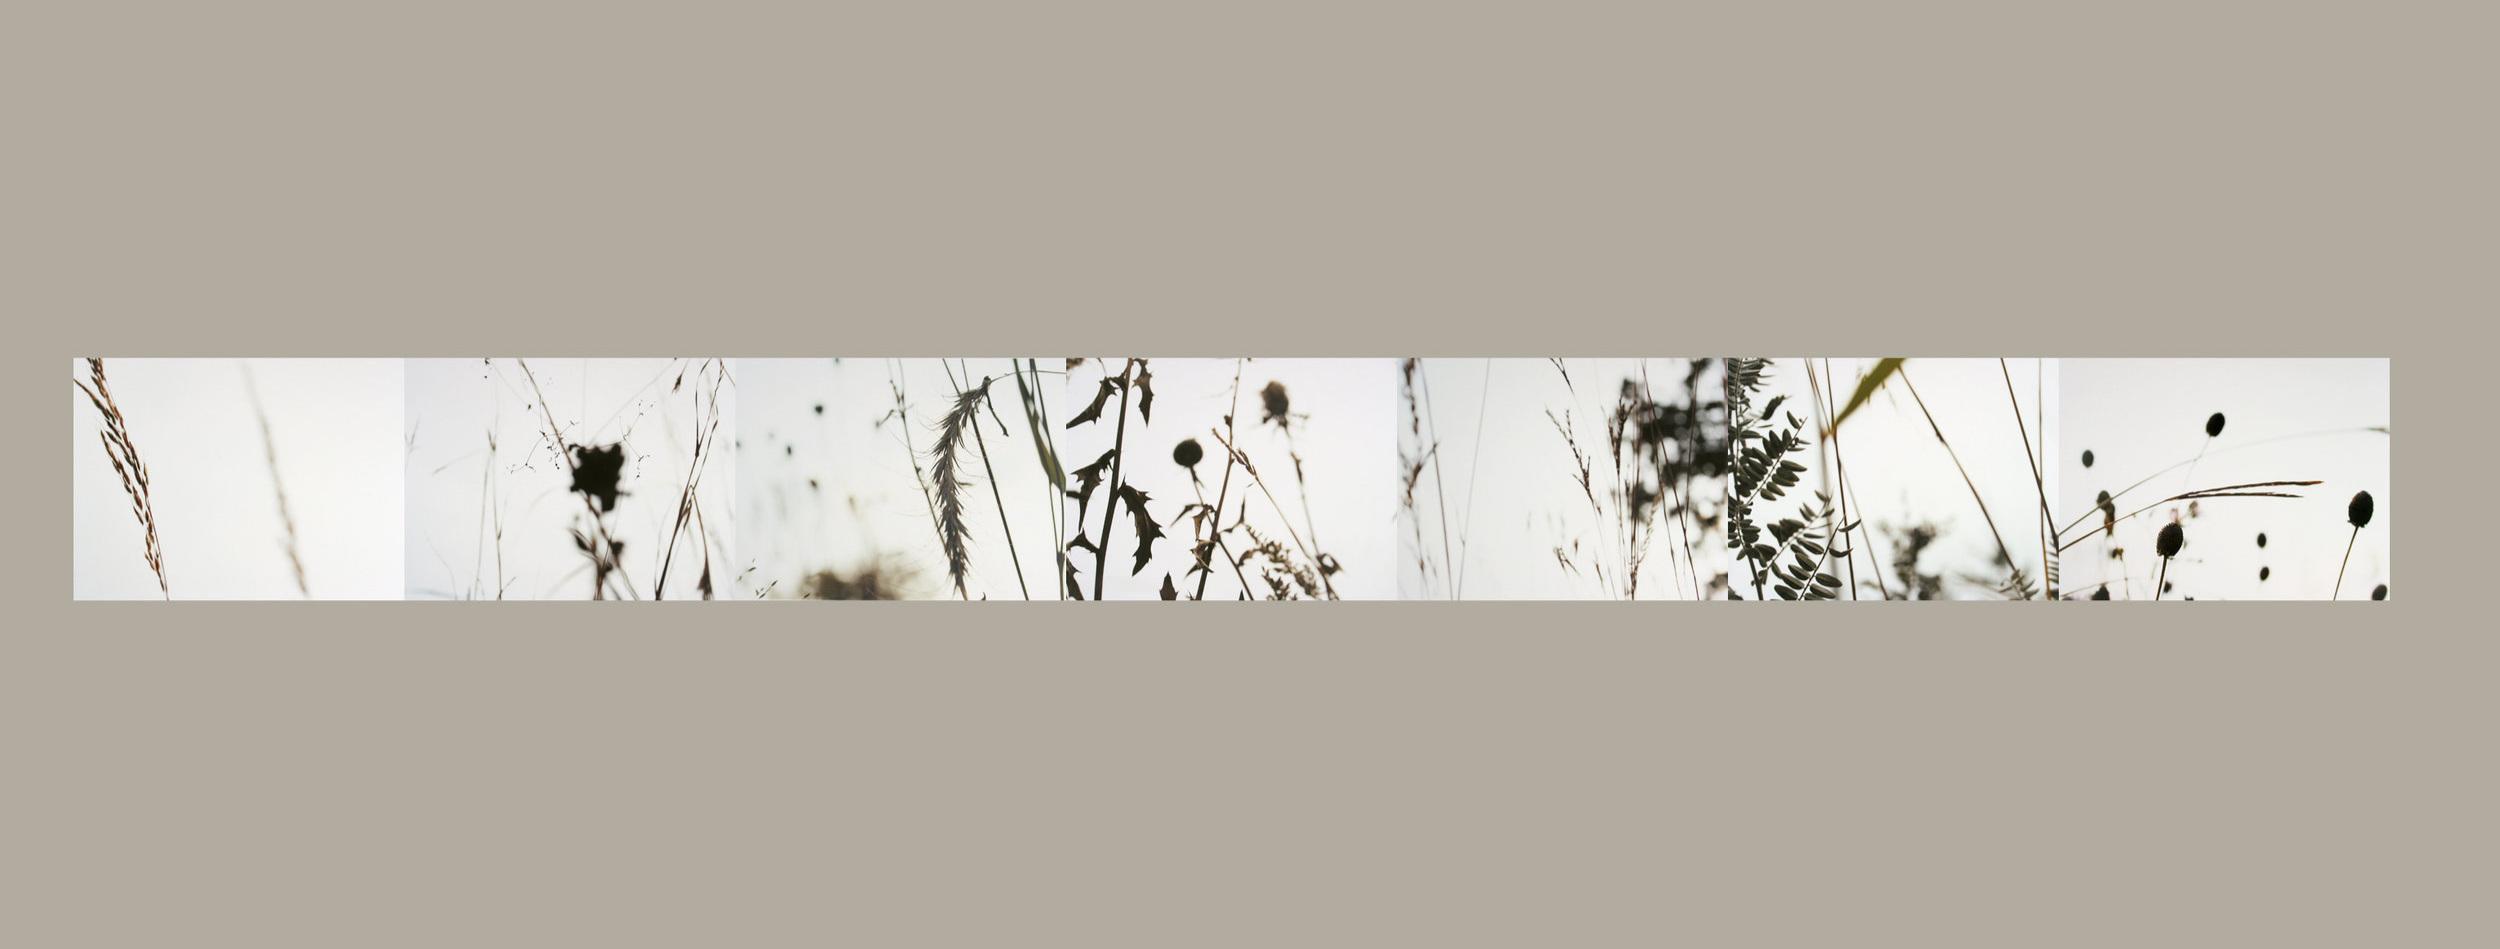 Prairie Grasses Limning